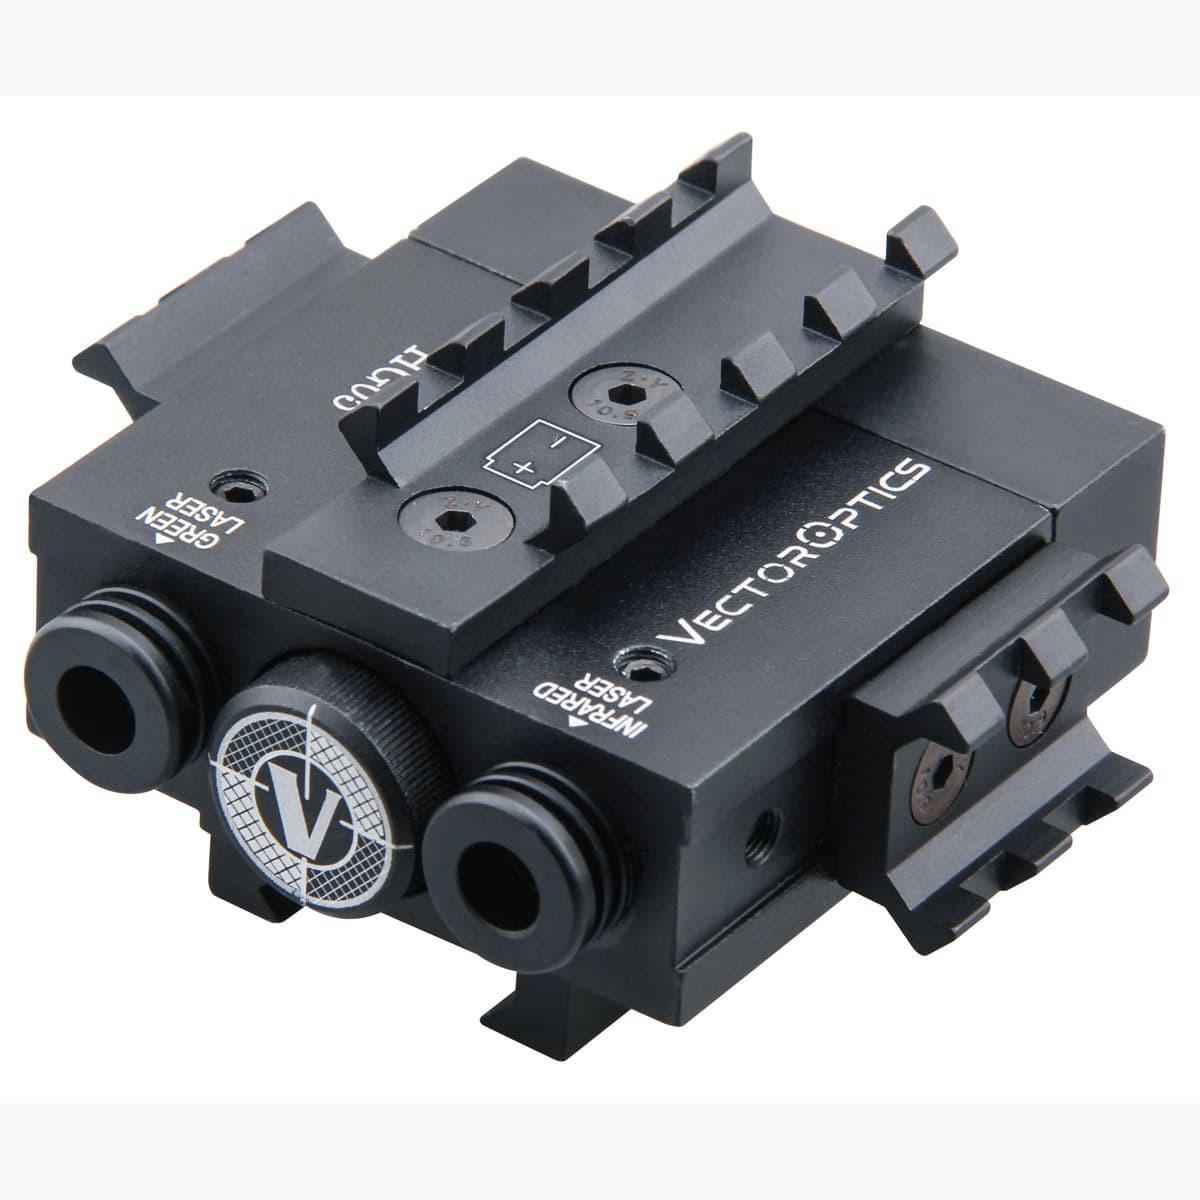 Mira Laser / IR Laser Combo Viperwolf  Vector Optics